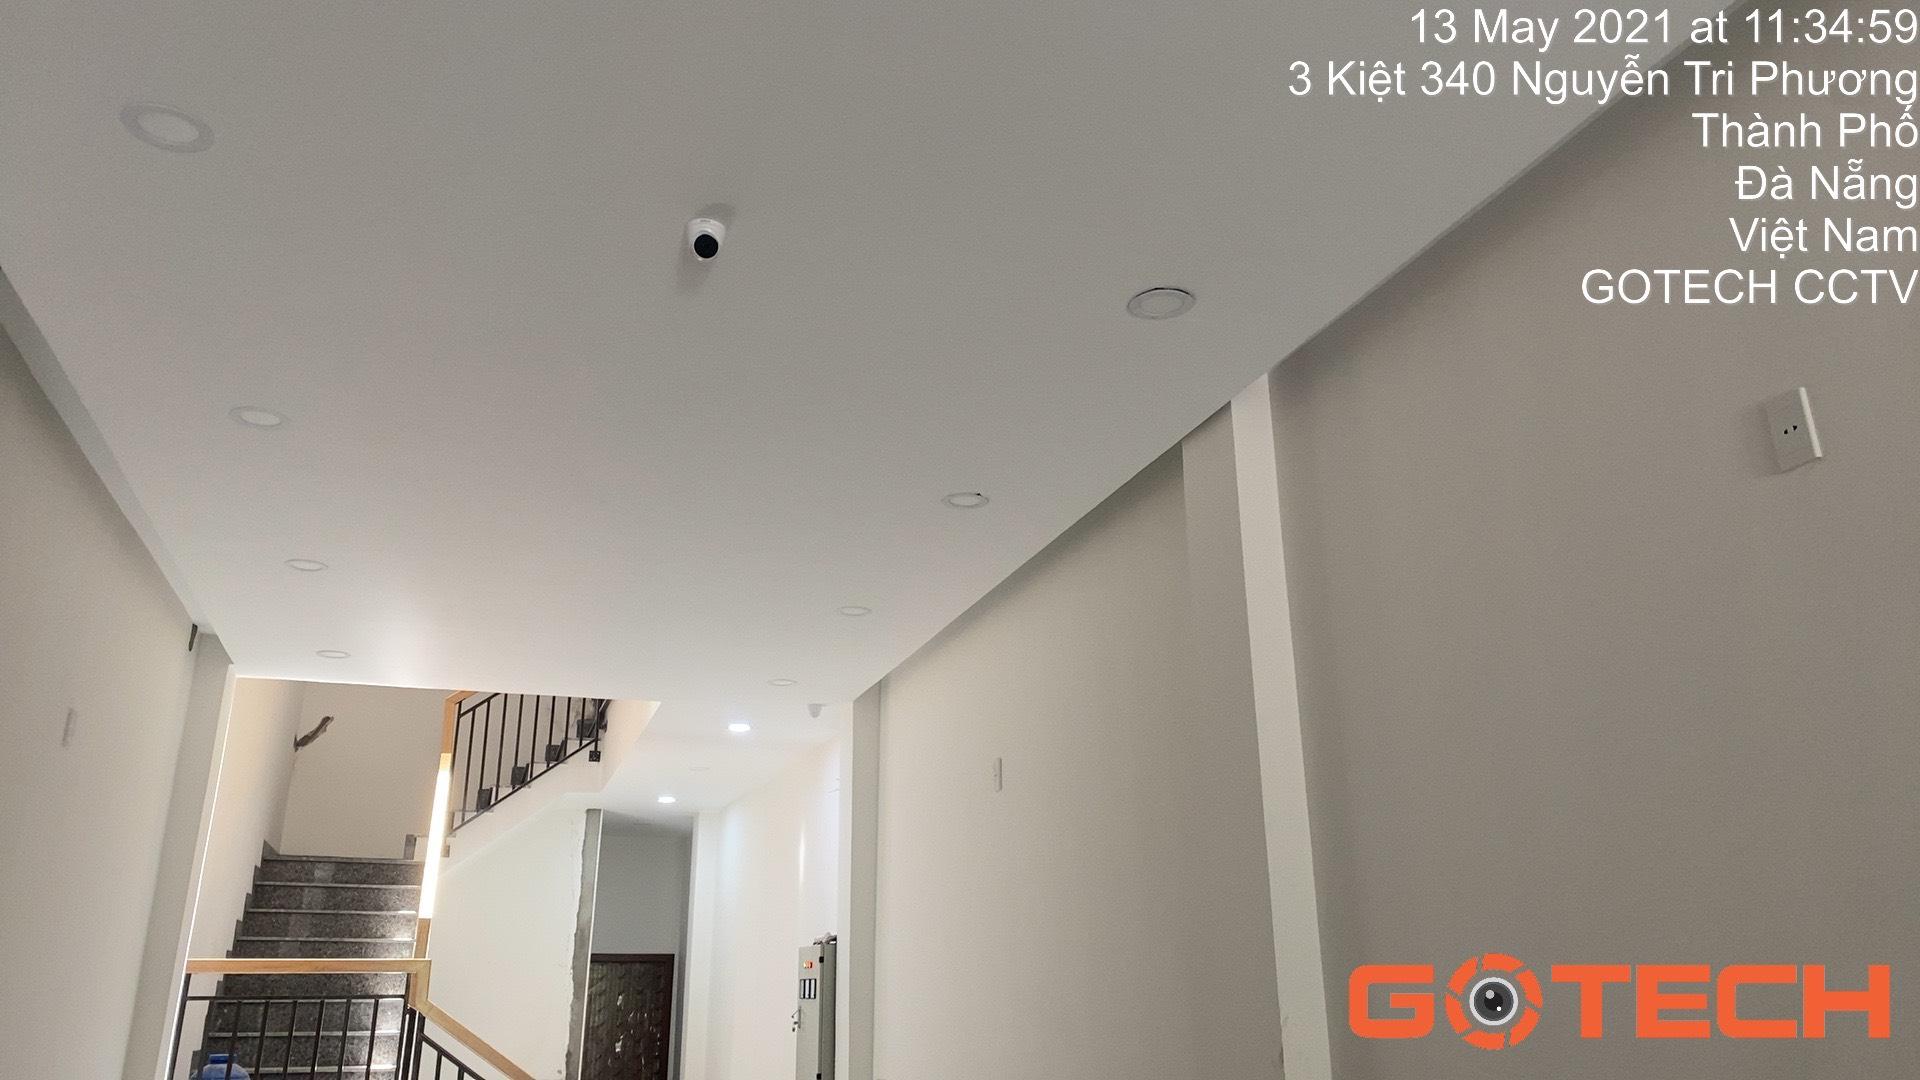 lap-dat-camera-gia-re-pink-house-k340-nguyen-tri-phuong-1